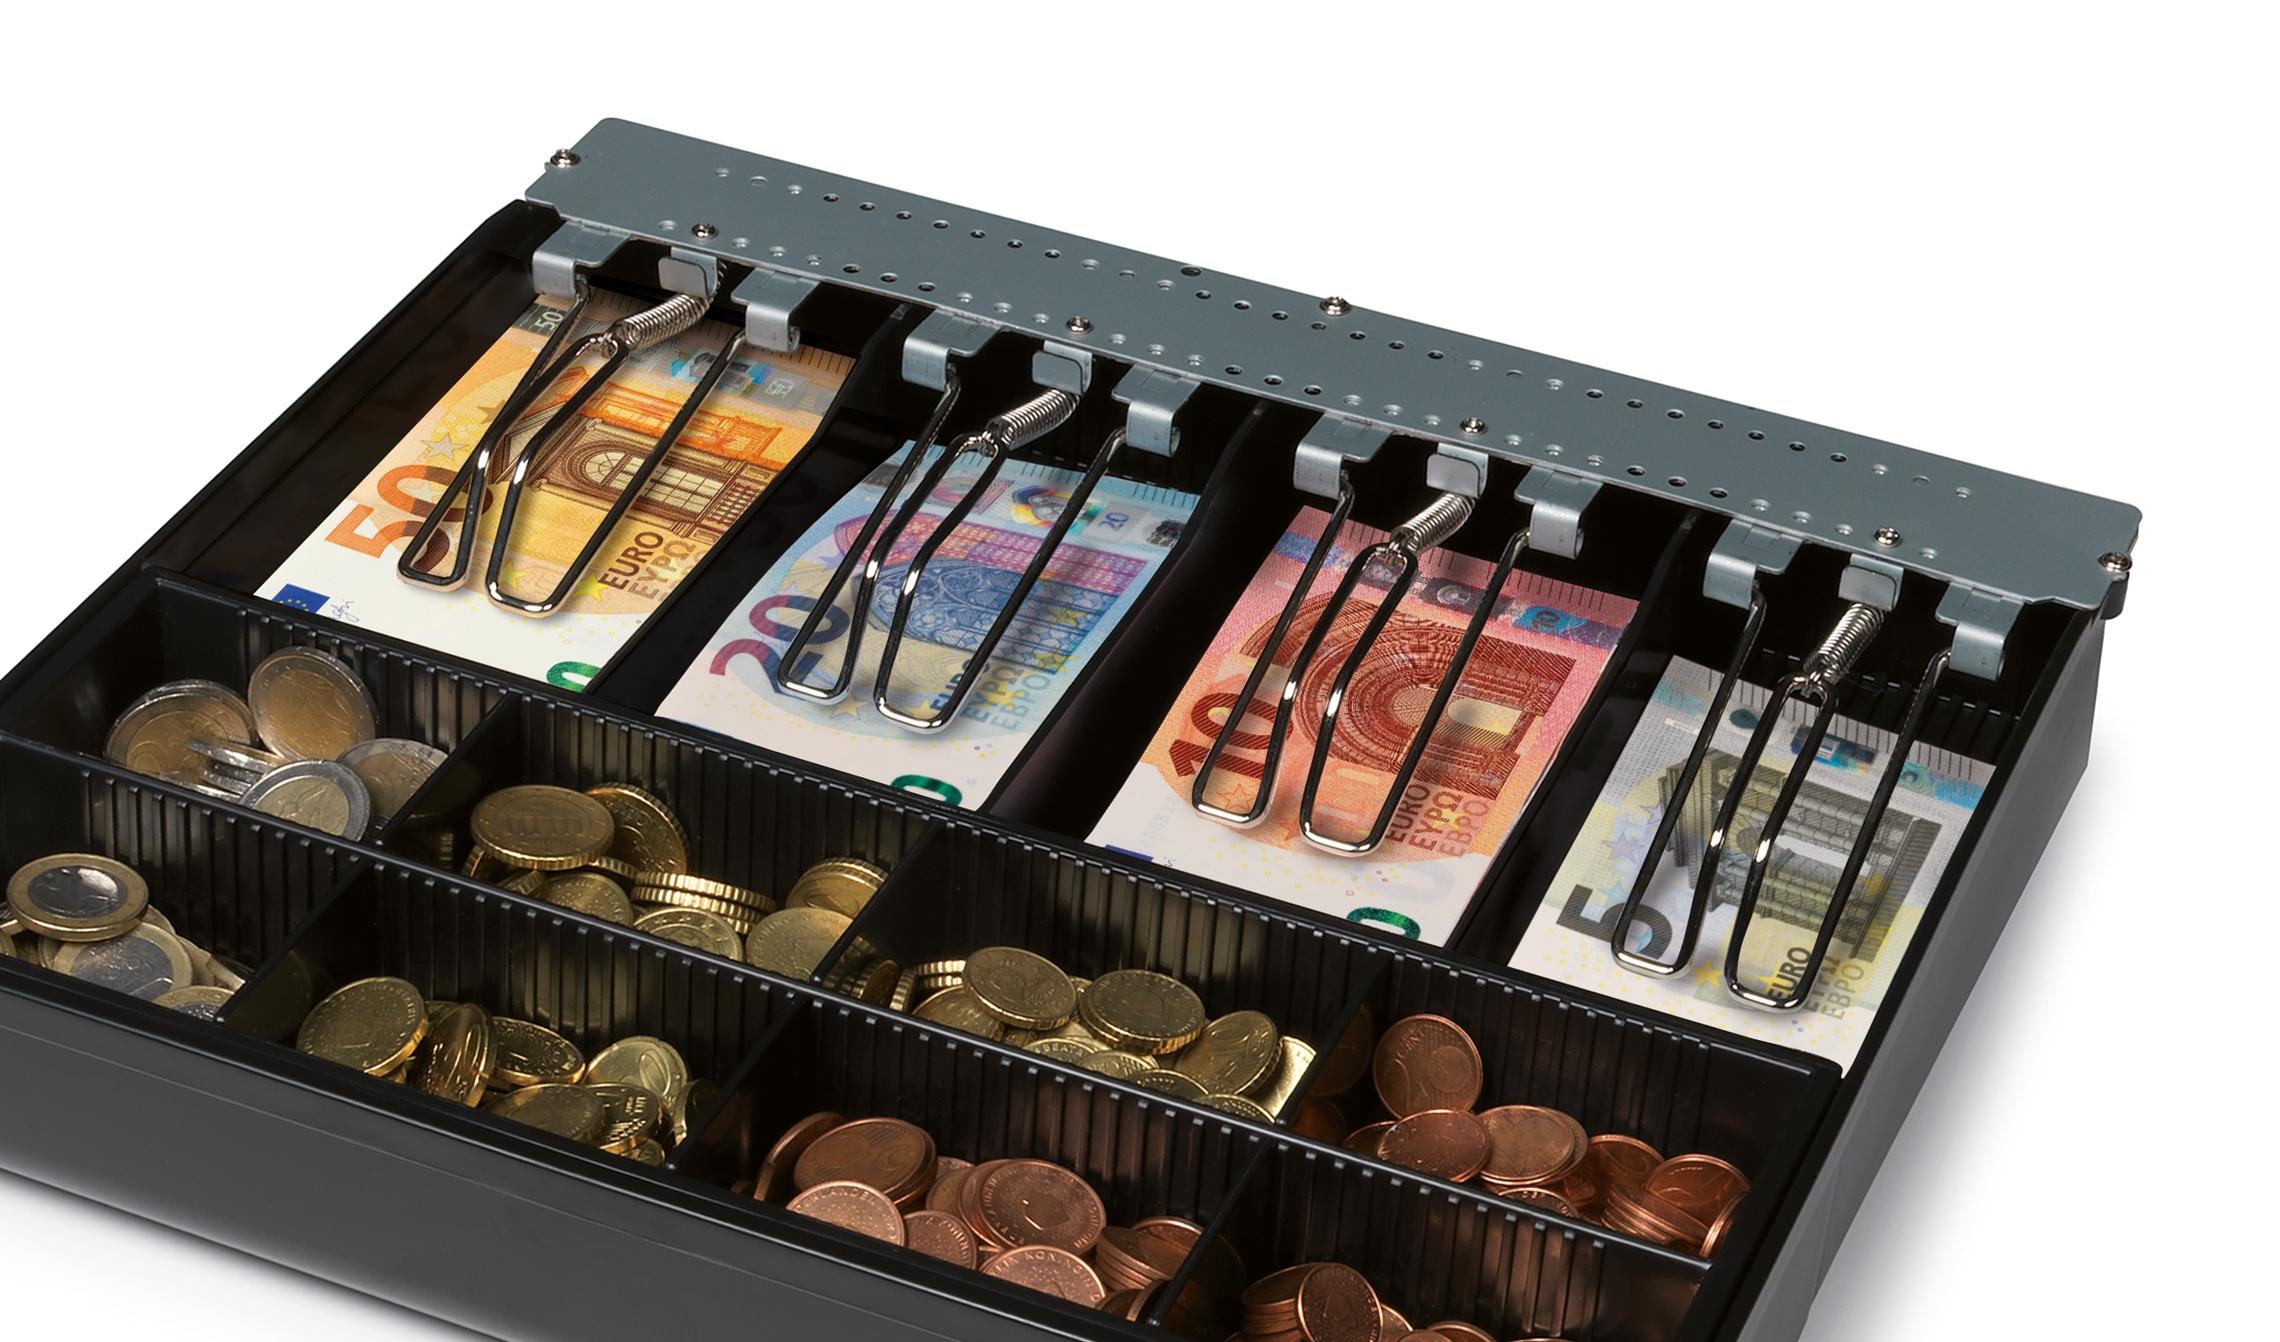 safescan-3540t-inzetbak-voor-munten-en-bankbiljetten